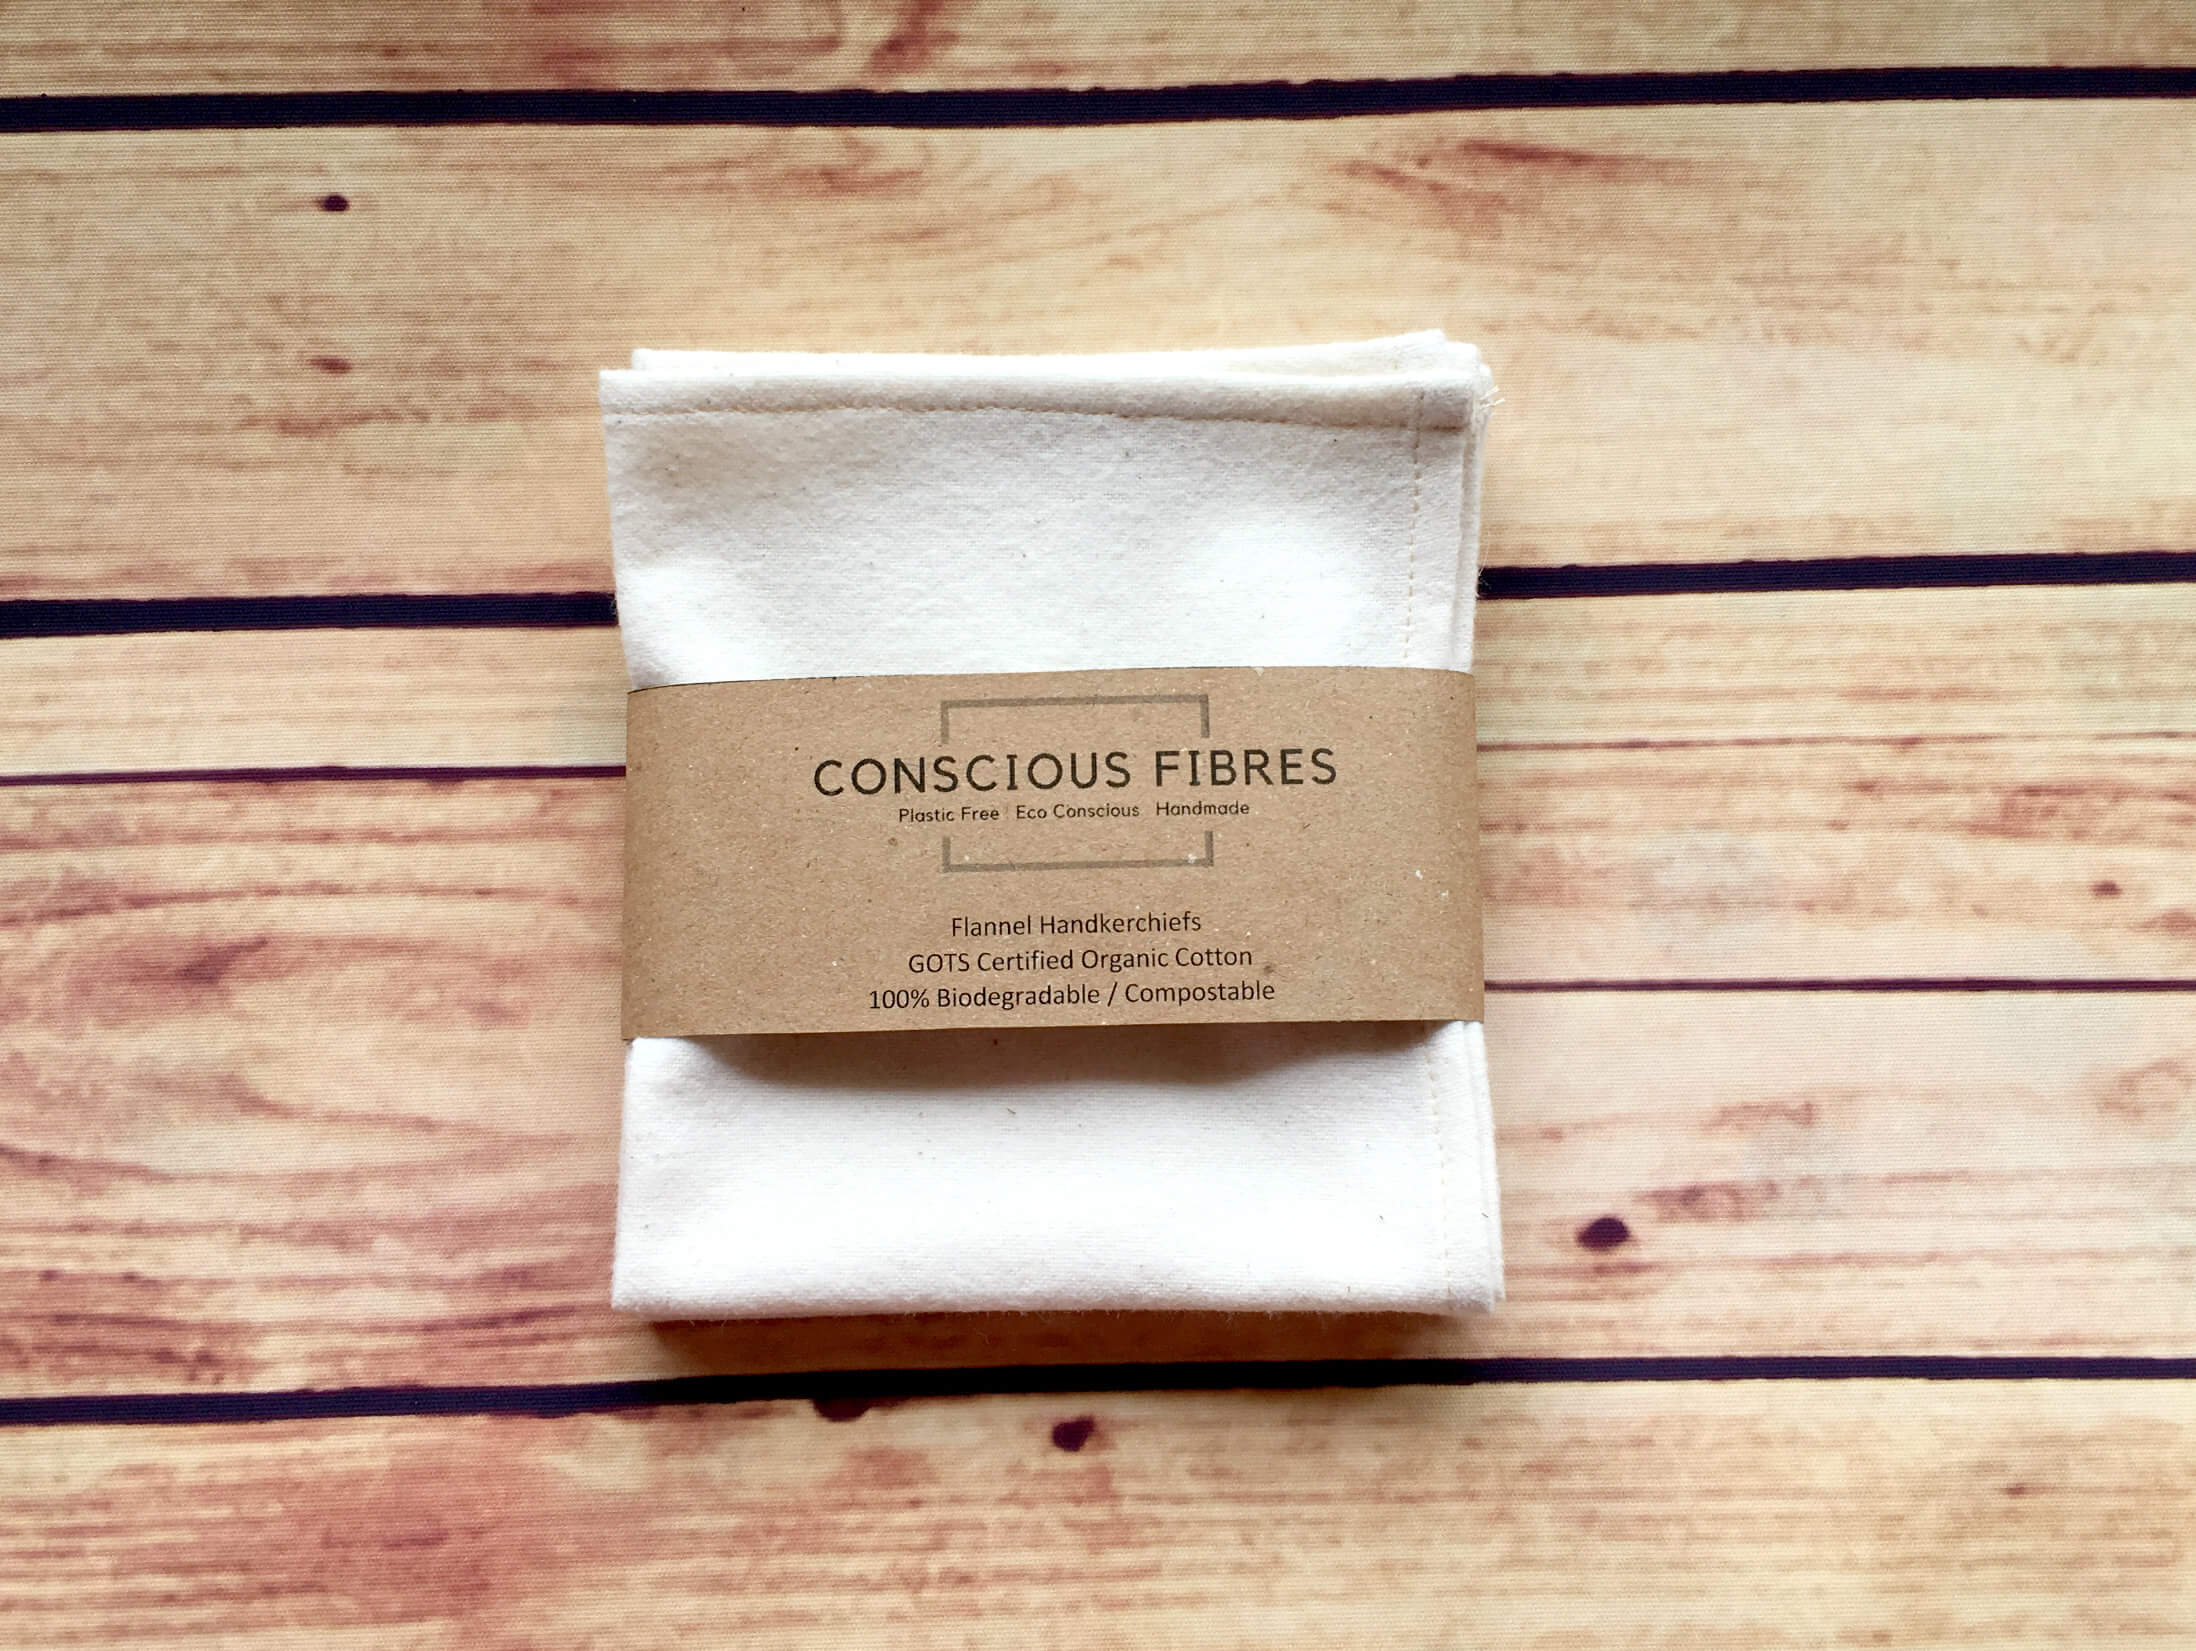 Conscious Fibres flannel handkerchiefs